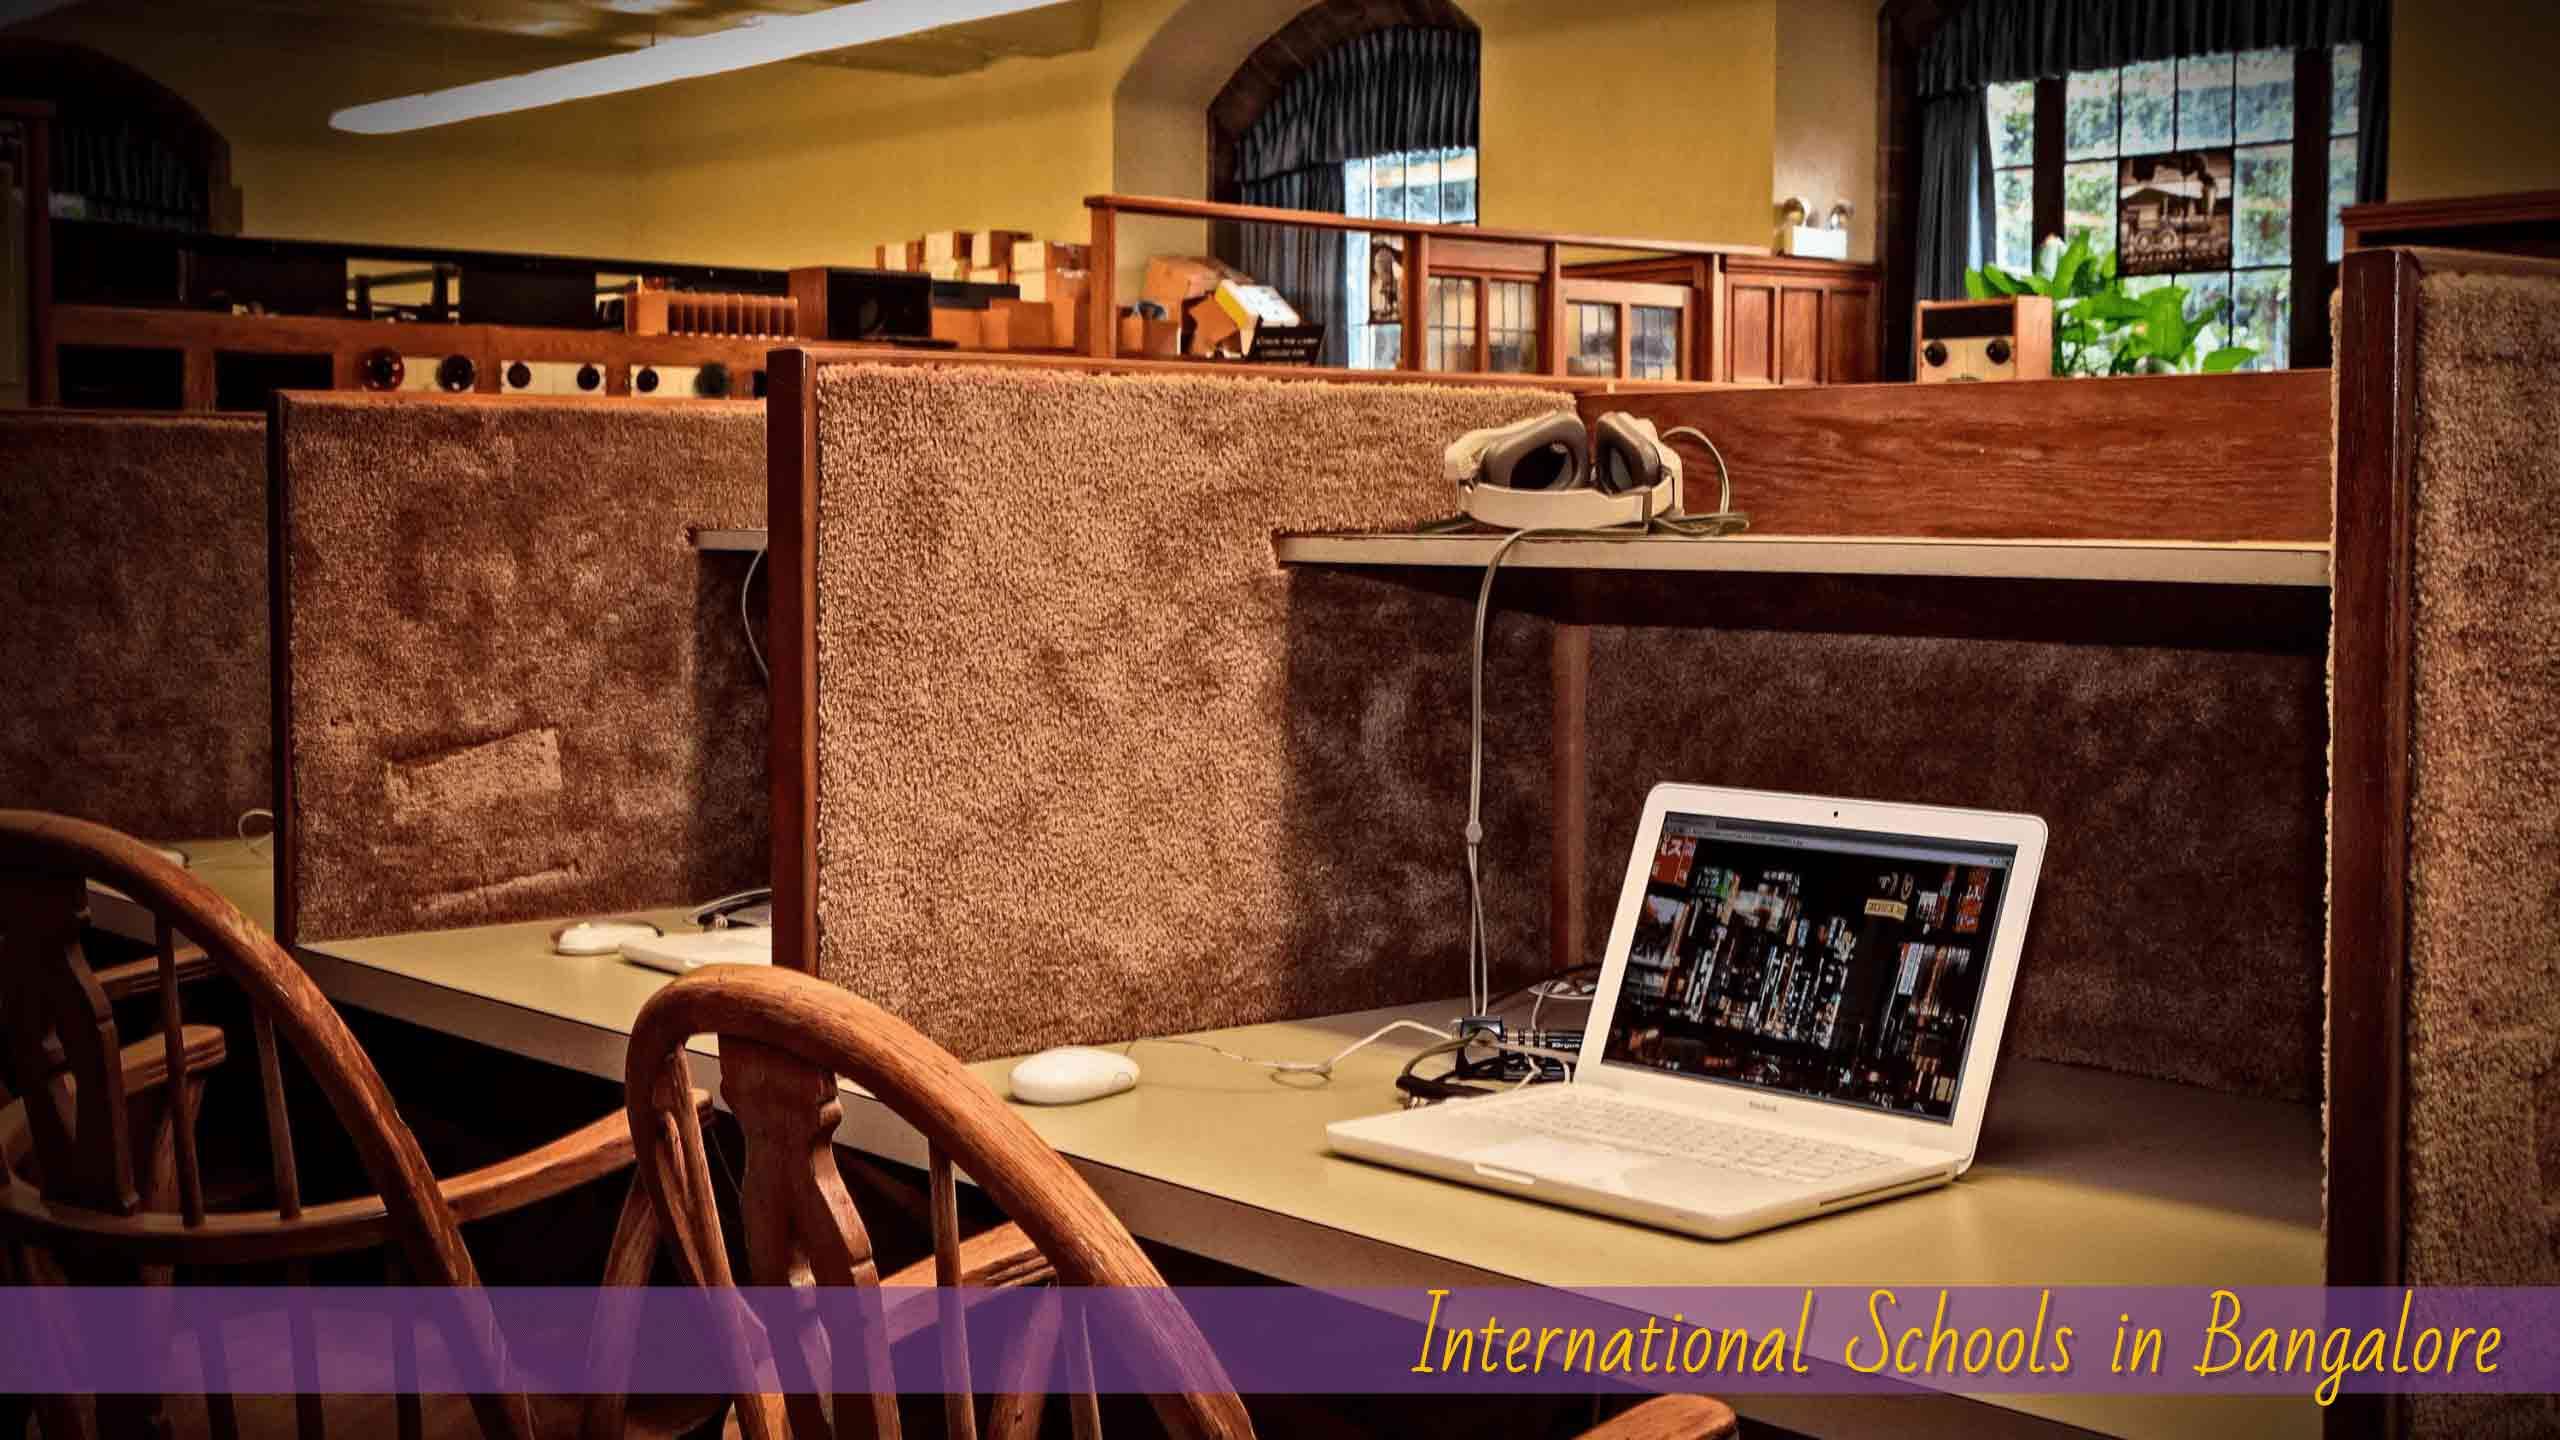 International School in Bangalore